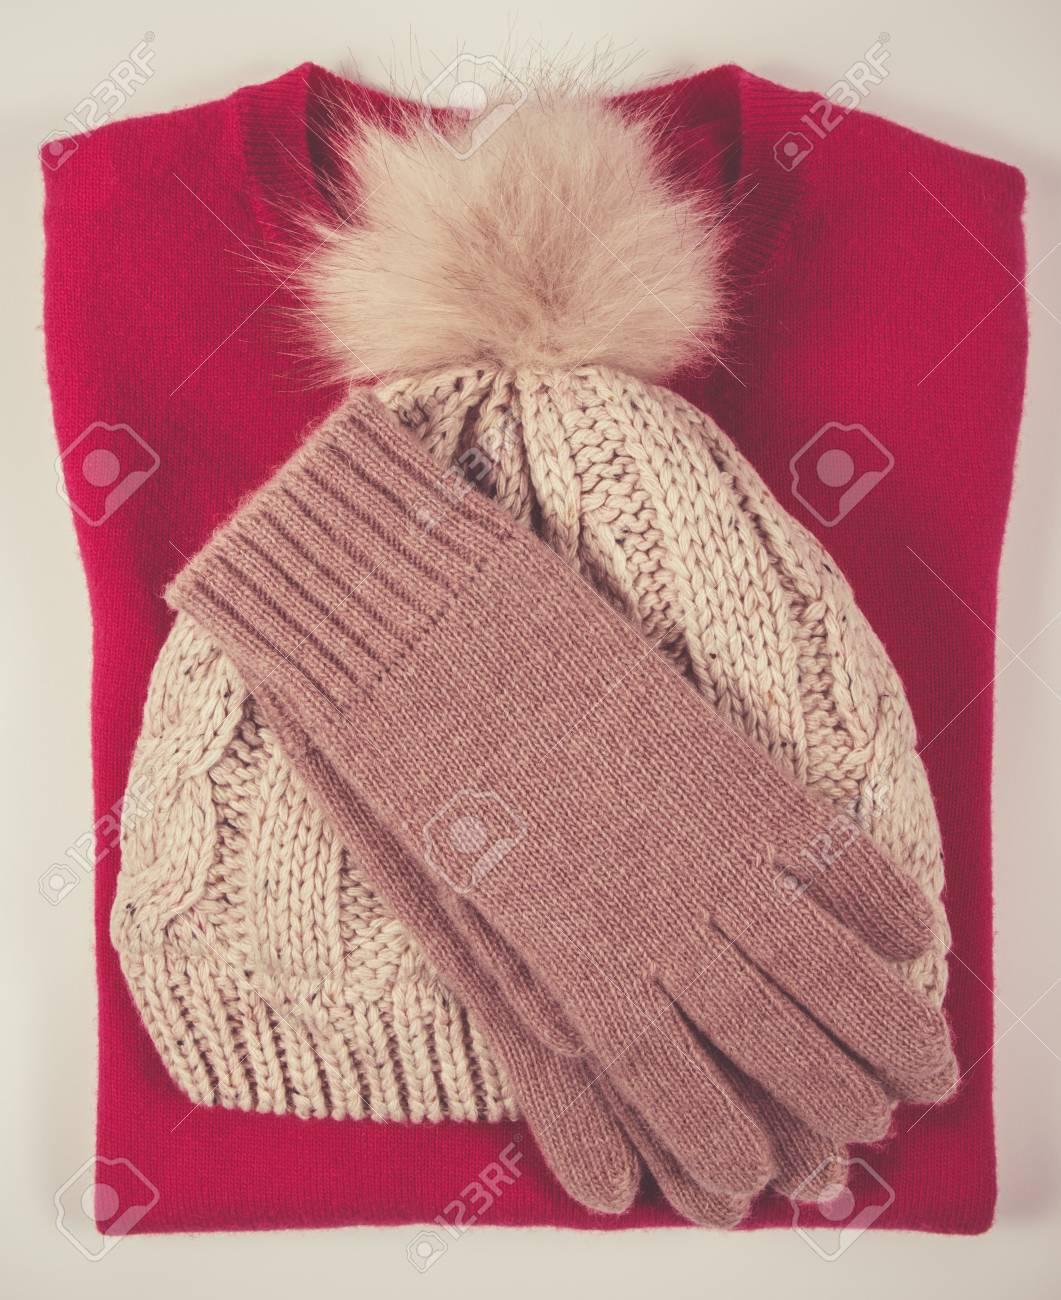 Stock Photo - Women s woolen hat 3389d16cce2